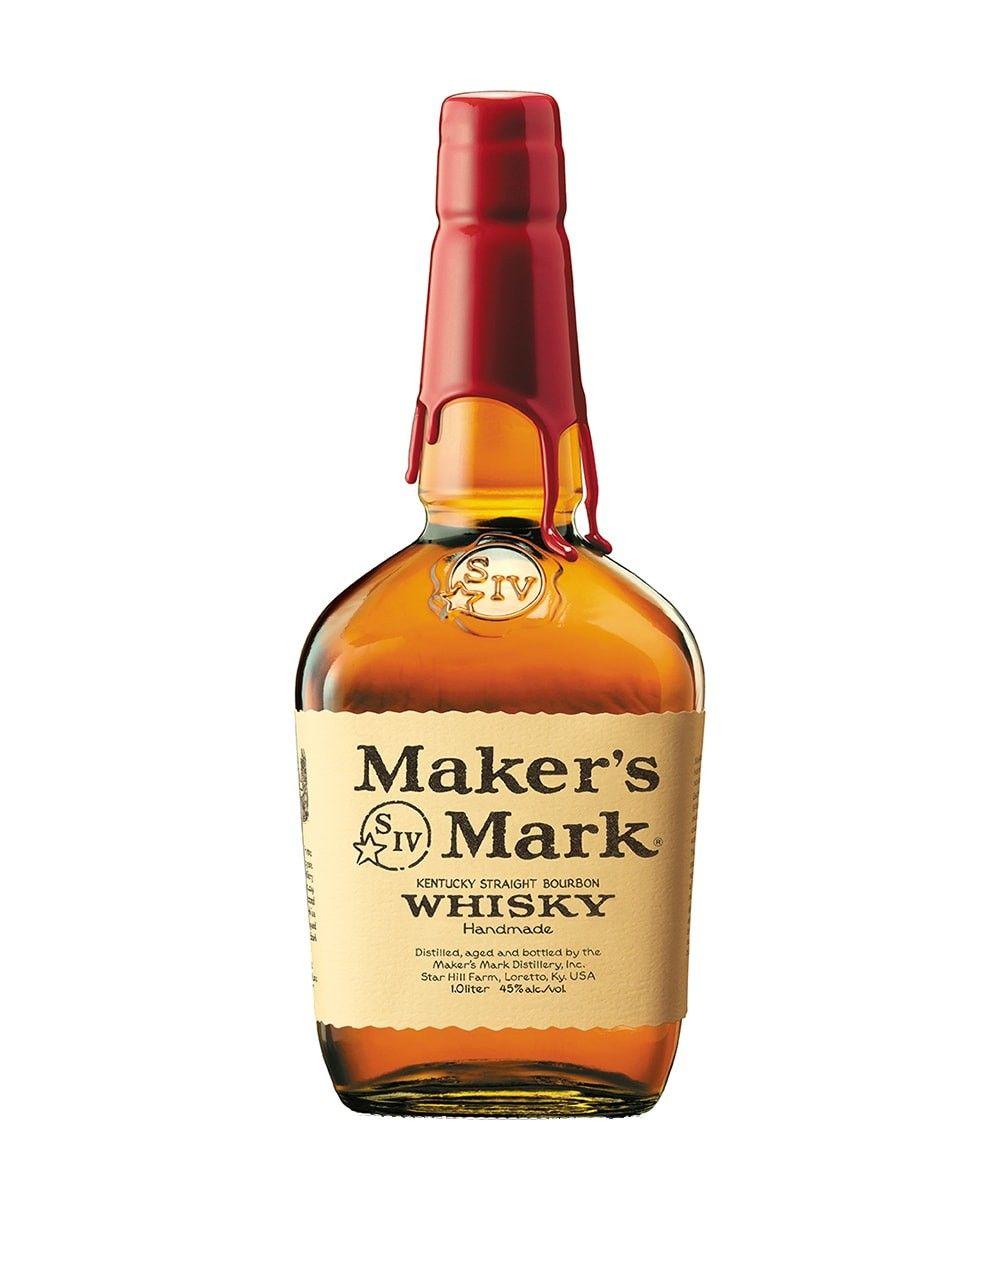 Maker S Mark Bourbon Whisky Buy Online Or Send As A Gift